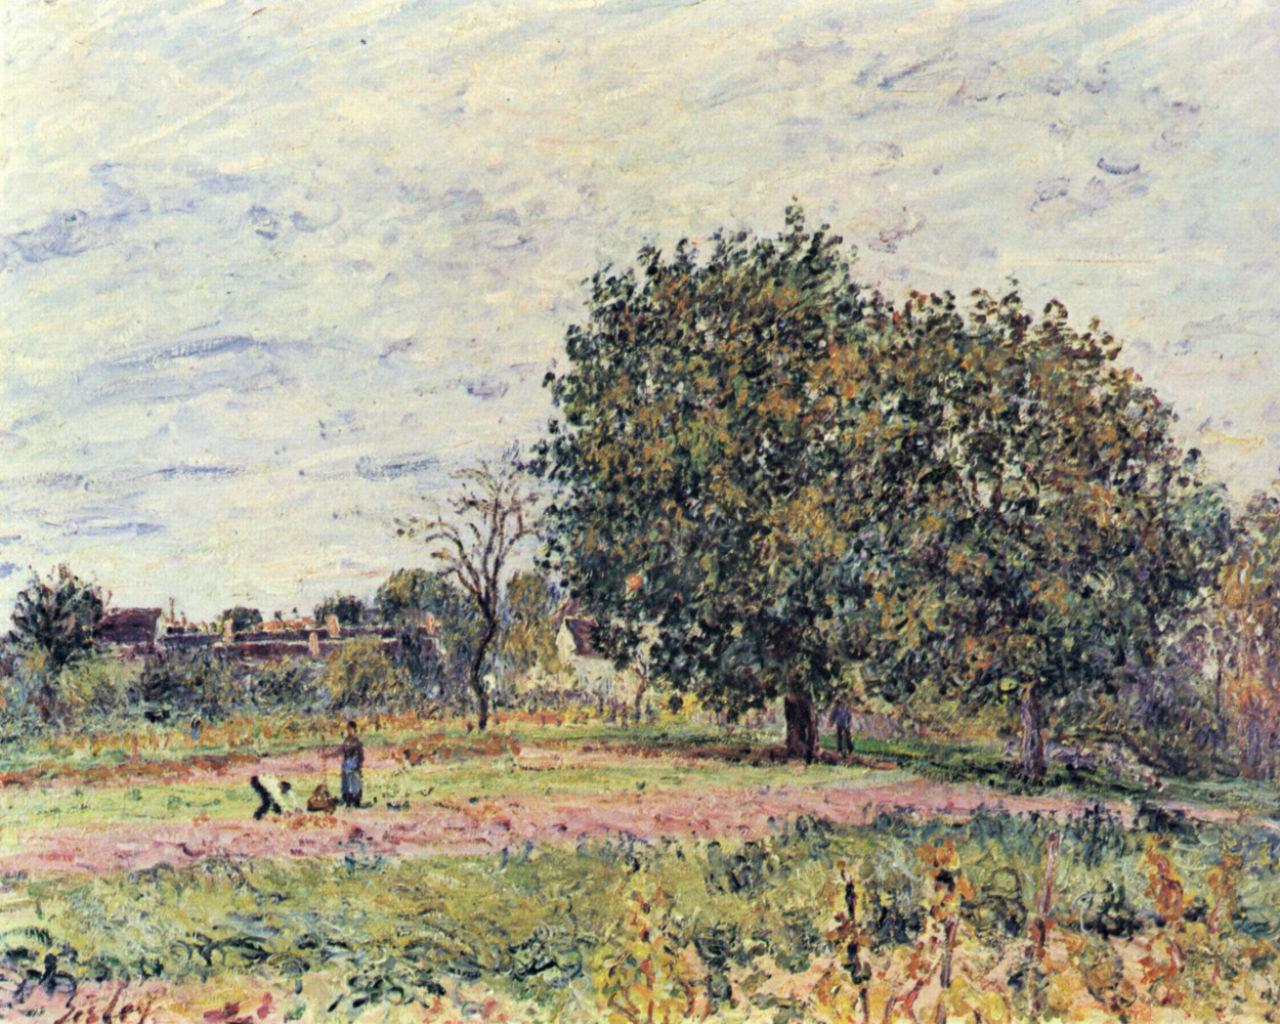 22-Орешник на закате в начале октября - 1882.jpg